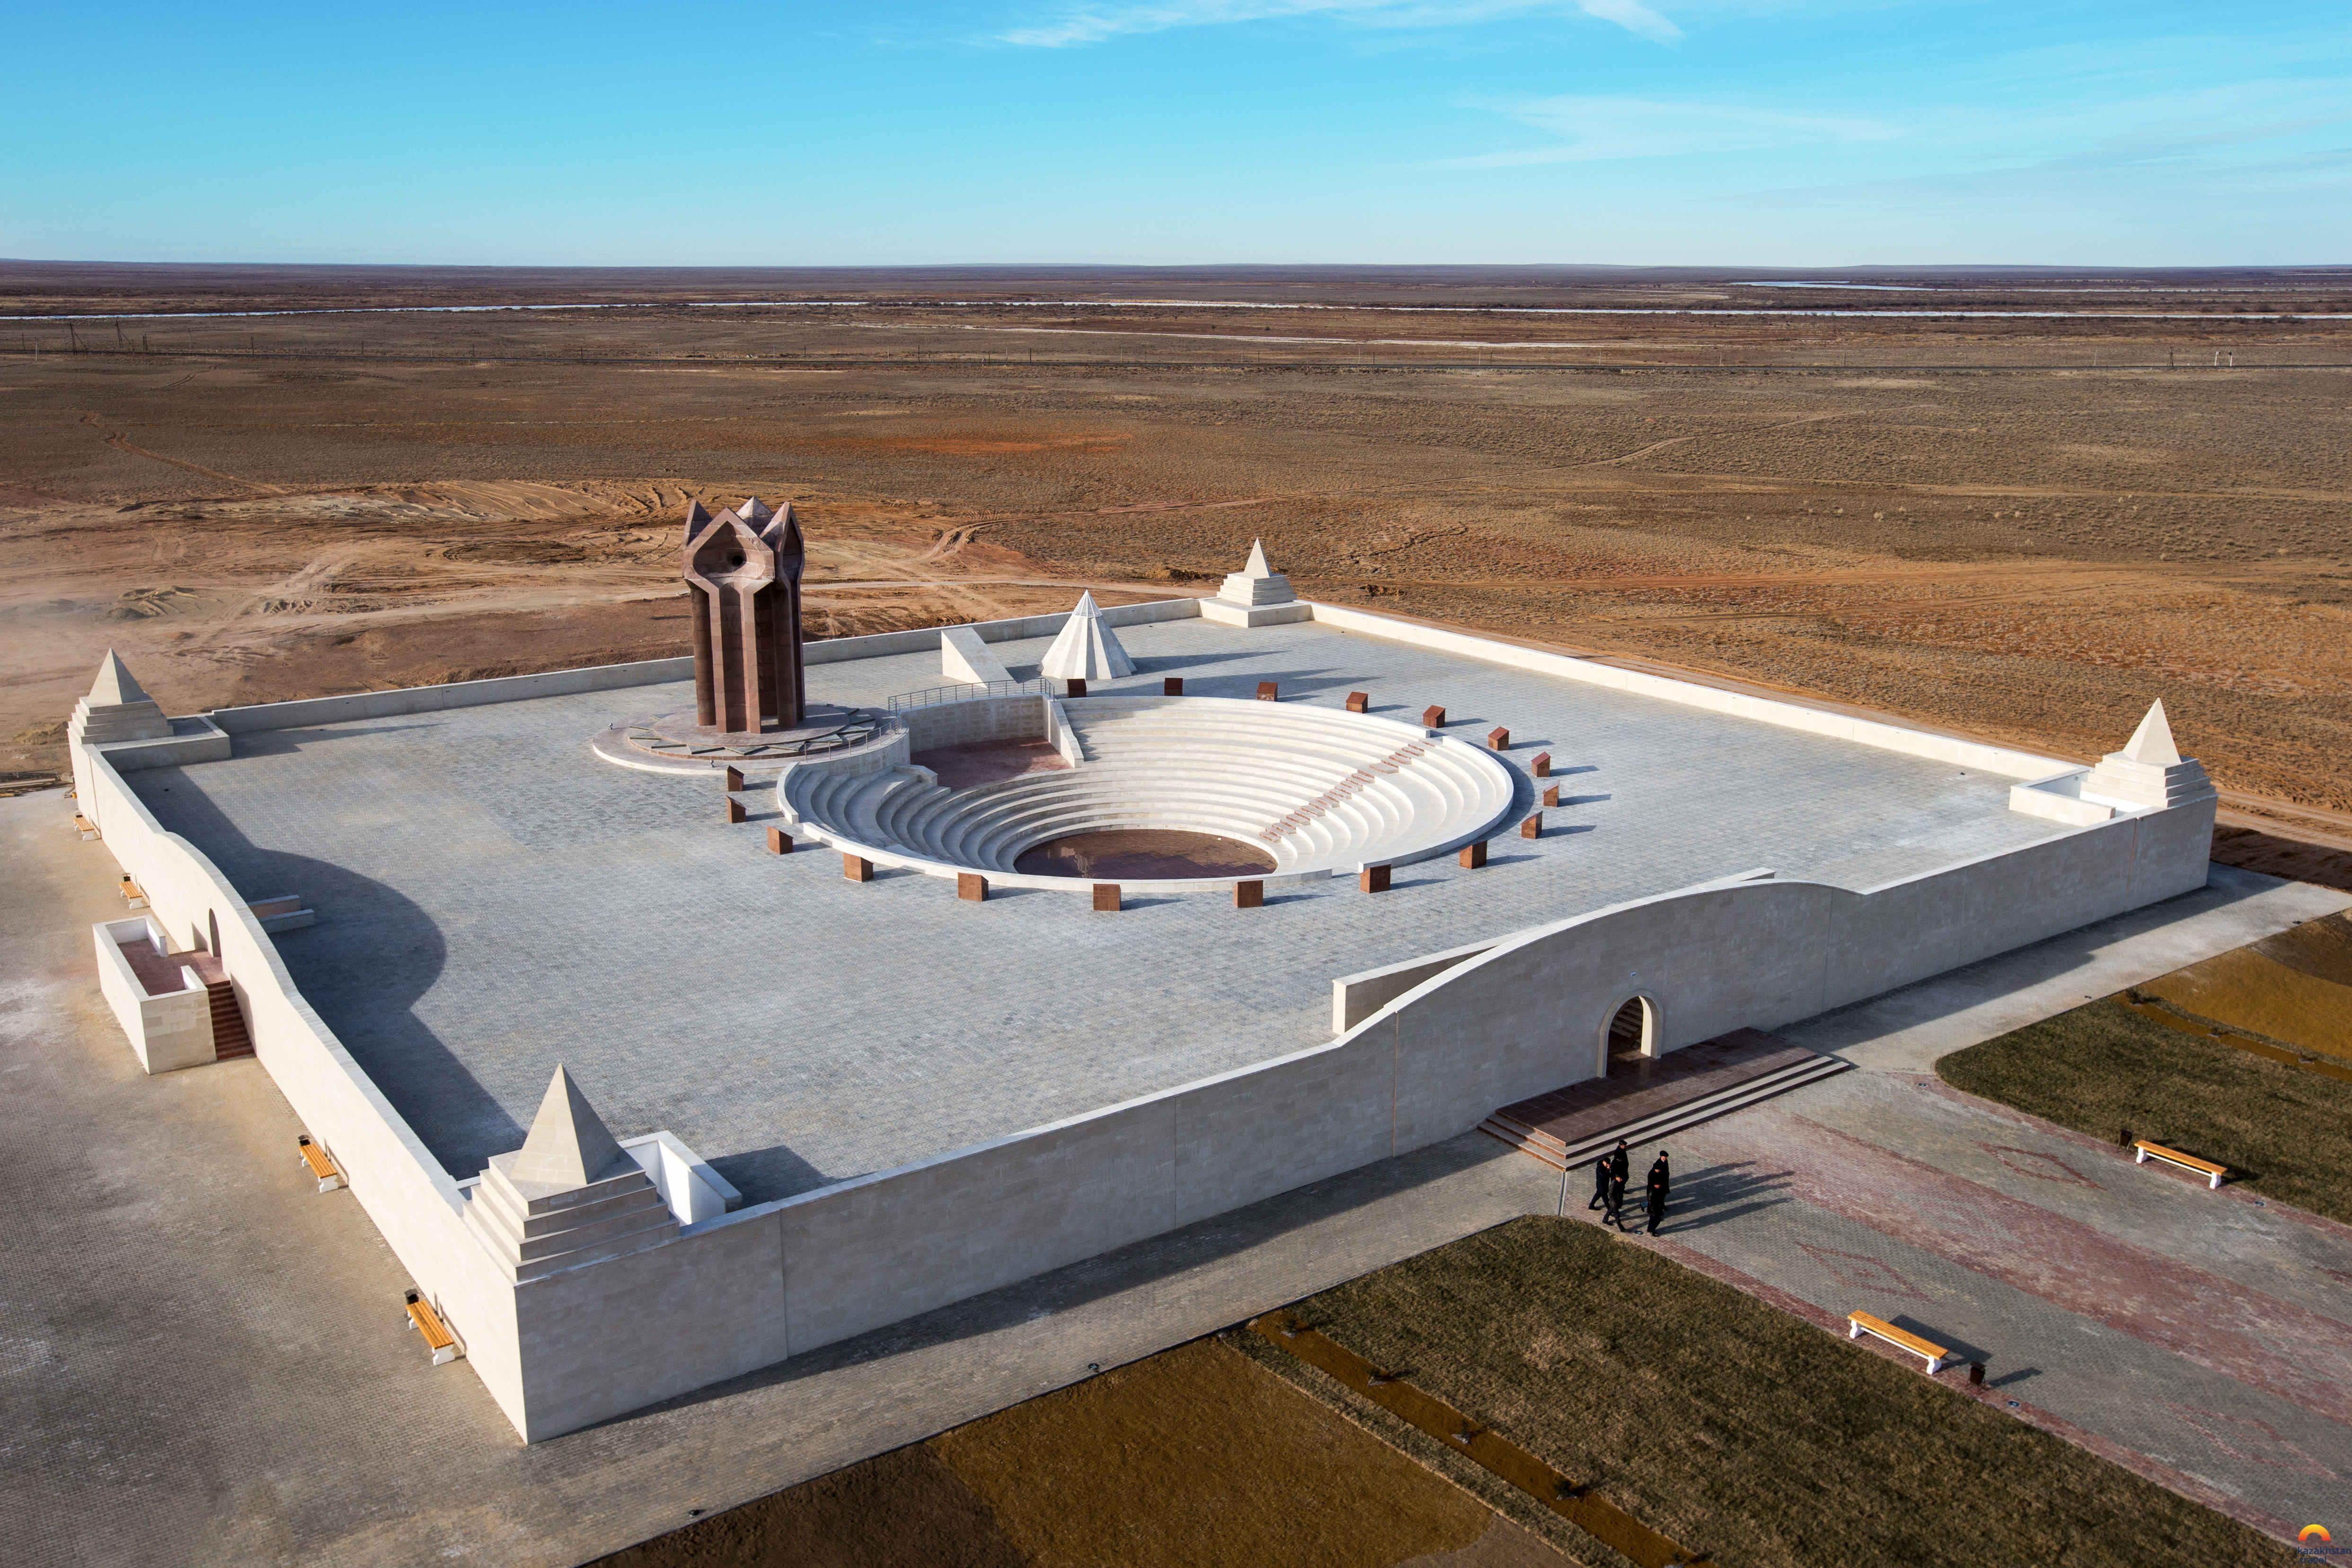 Korkyt Ata Memorial